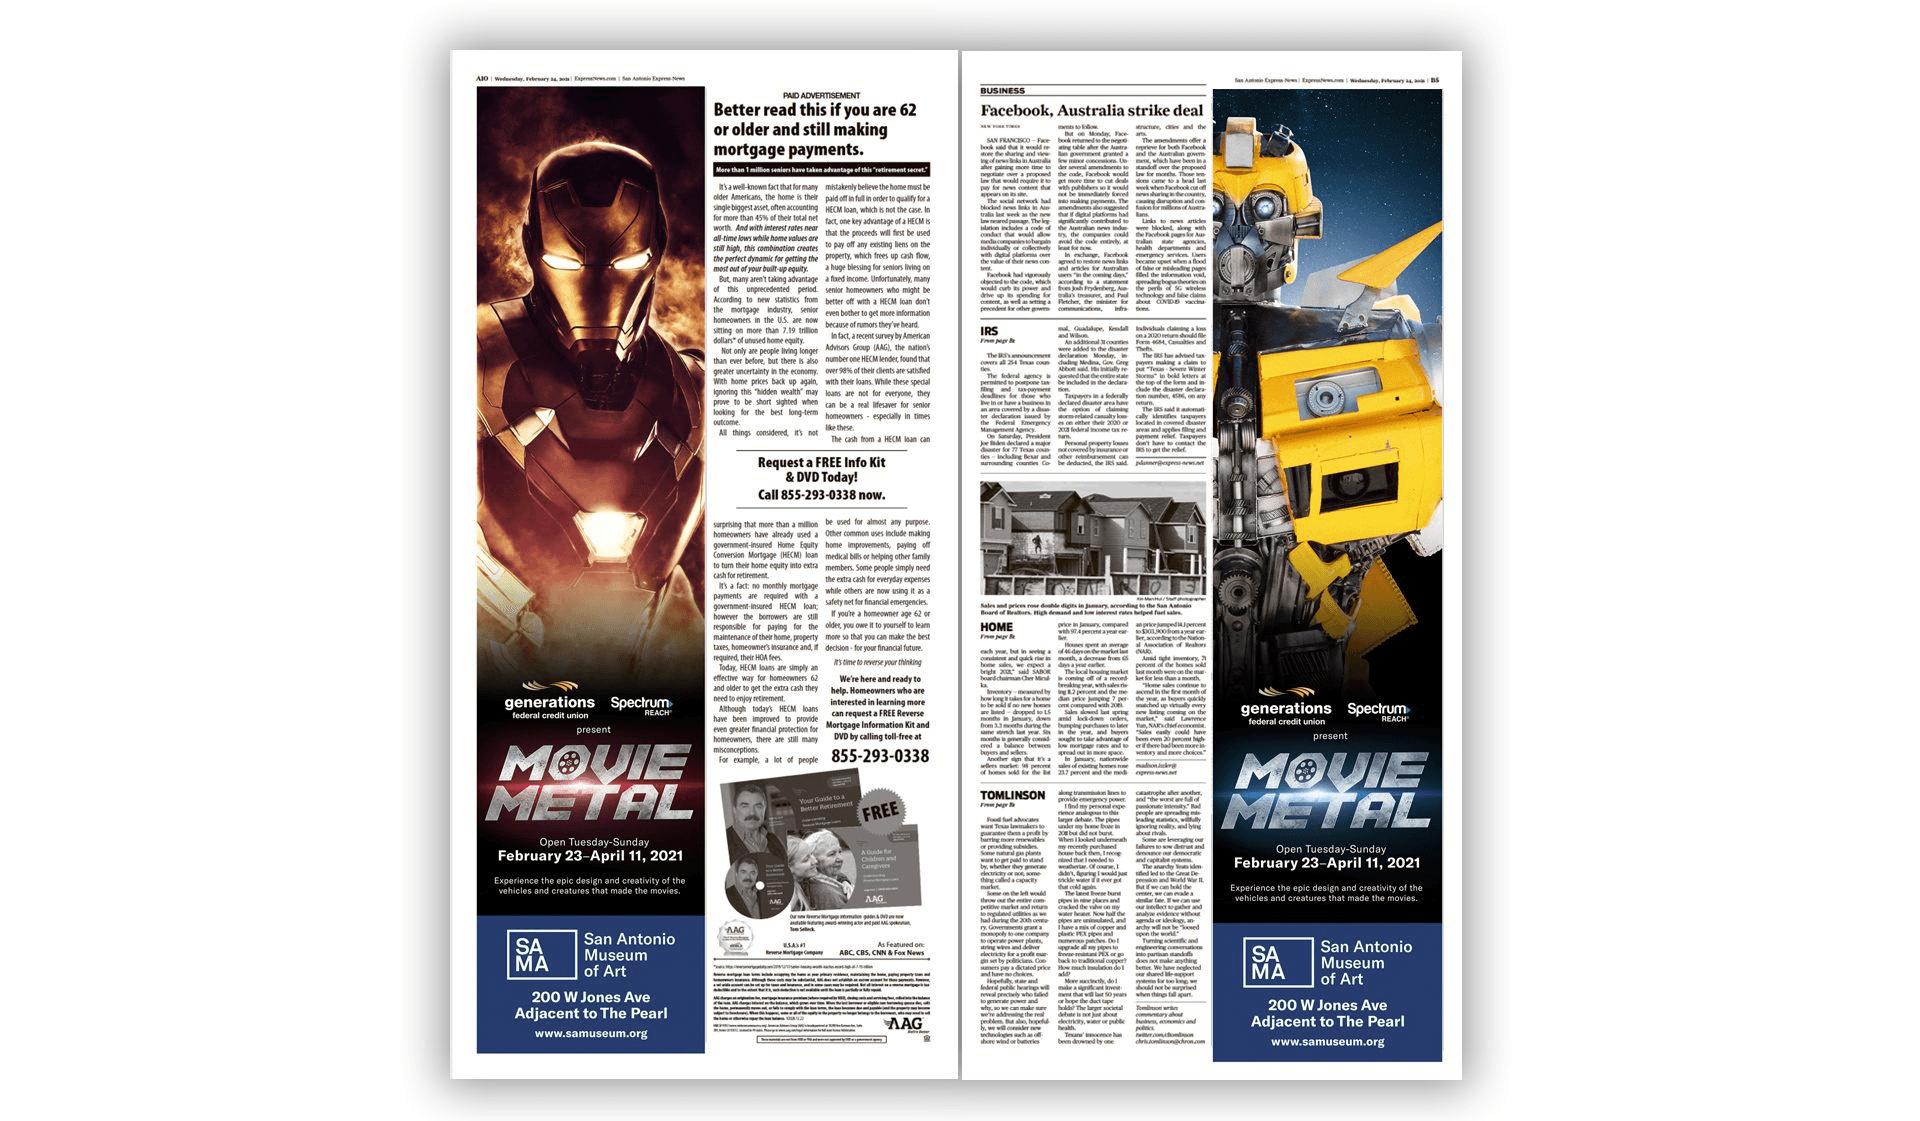 Movie Metal Exhibit Print Ads